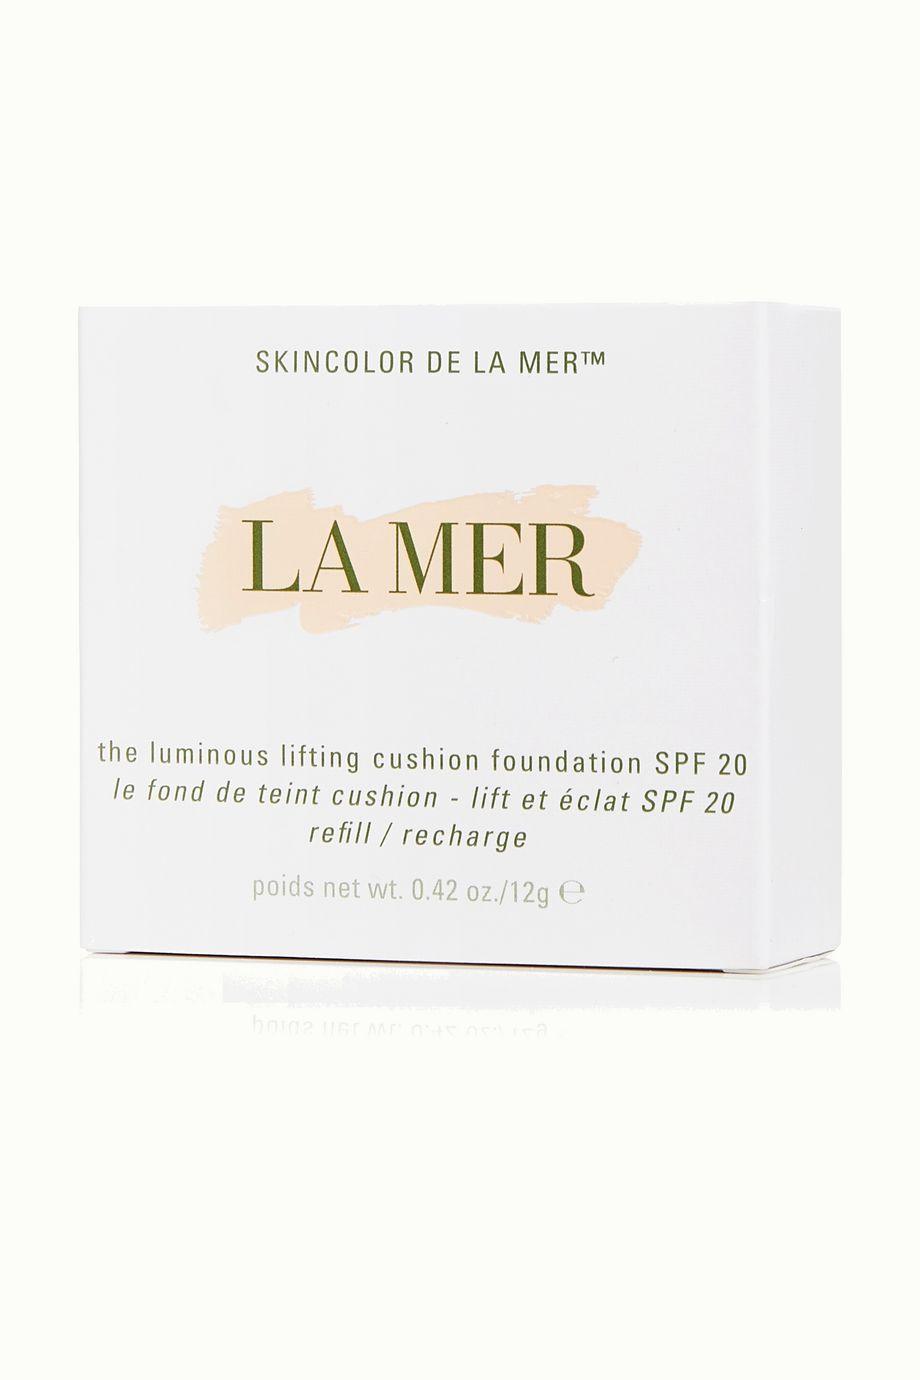 La Mer The Luminous Lifting Cushion Compact Foundation SPF20 Refill - 12 Neutral Ivory